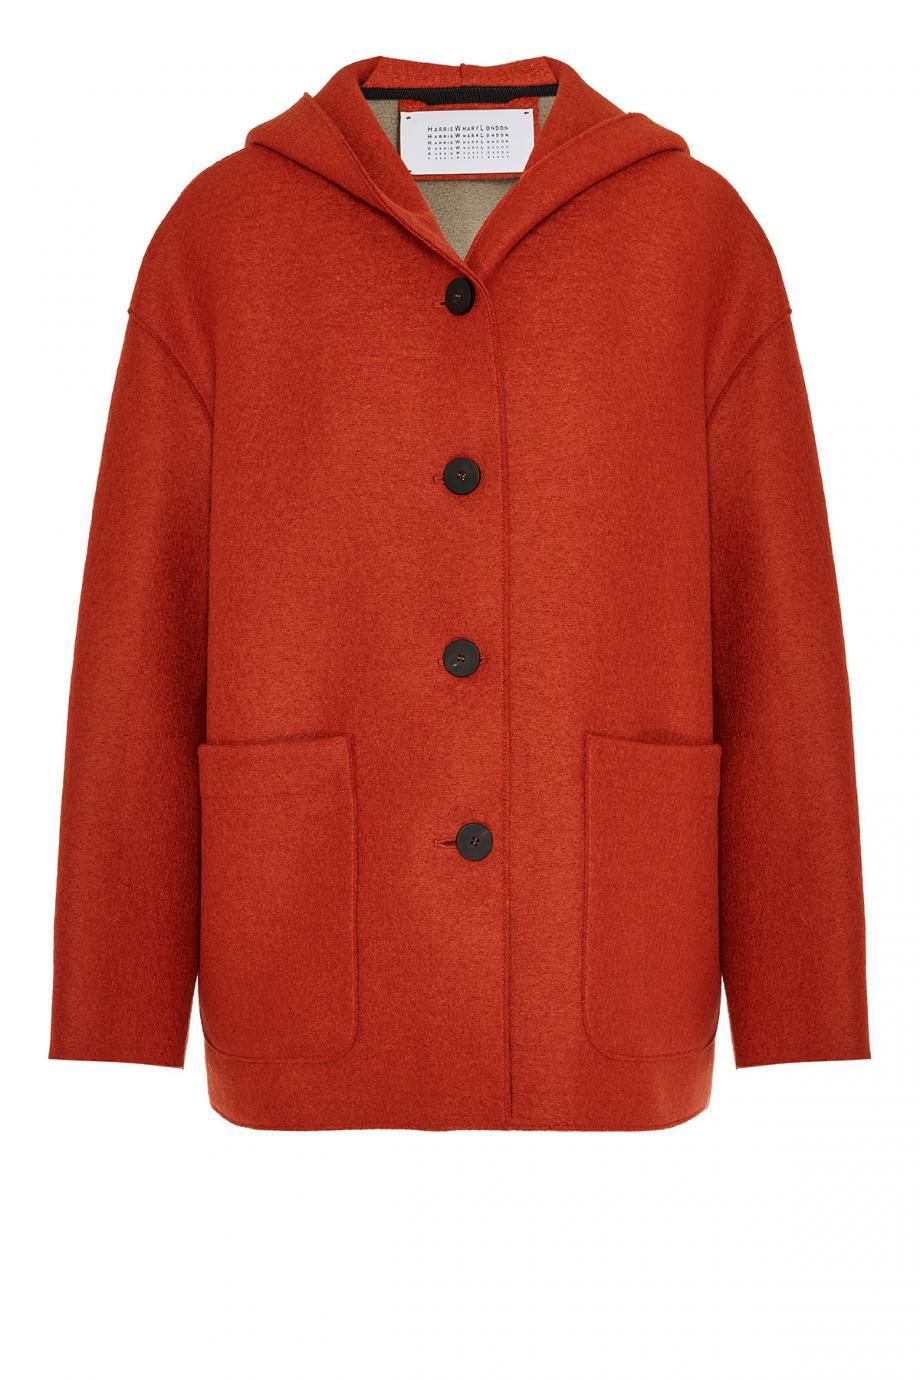 Oversized pressed-wool jacket